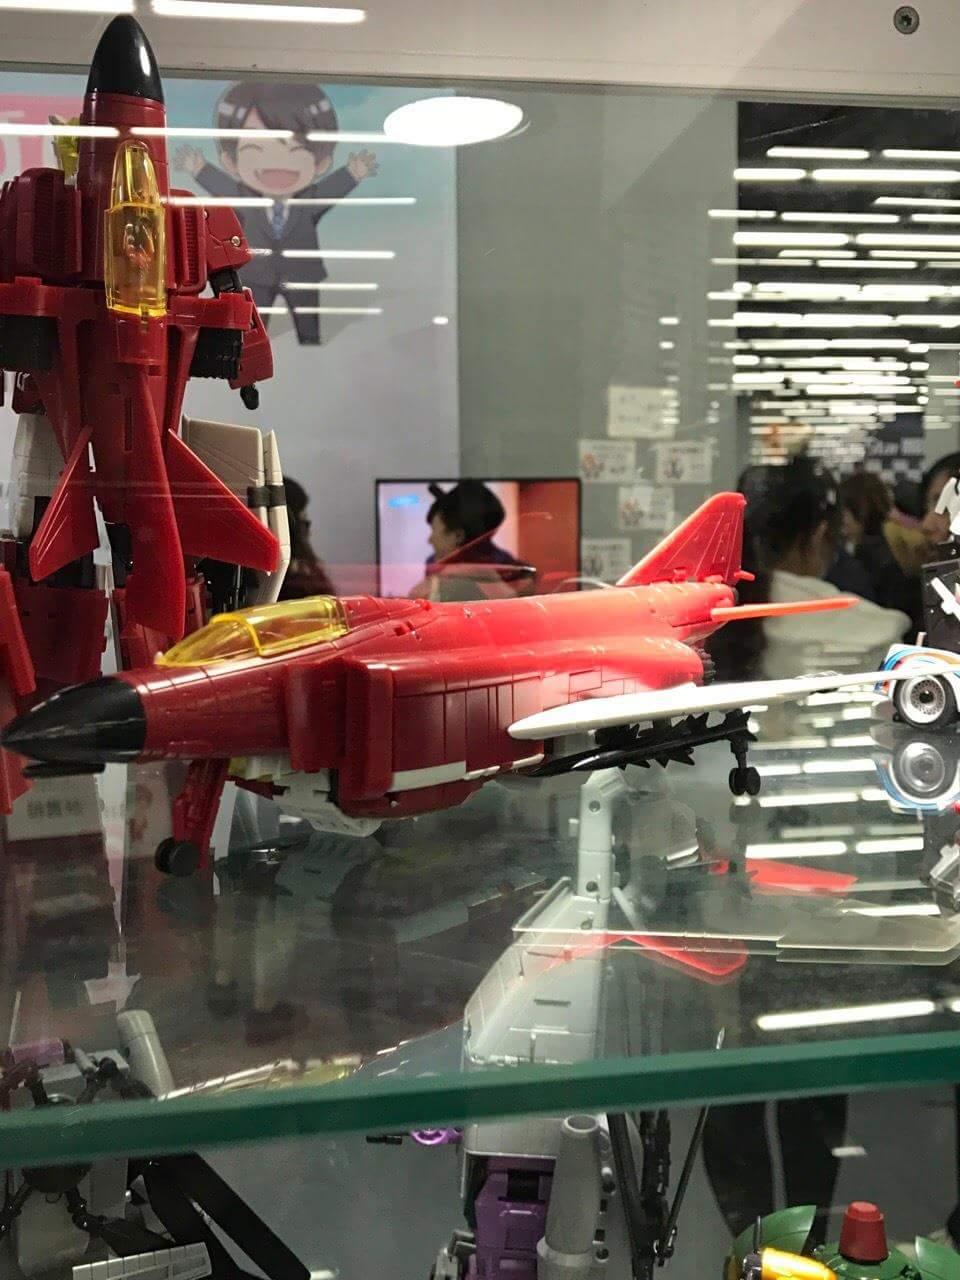 [Zeta Toys] Produit Tiers - Jouets ZB Kronos (ZB-01 à ZB-05) - aka Superion FLzkmNof